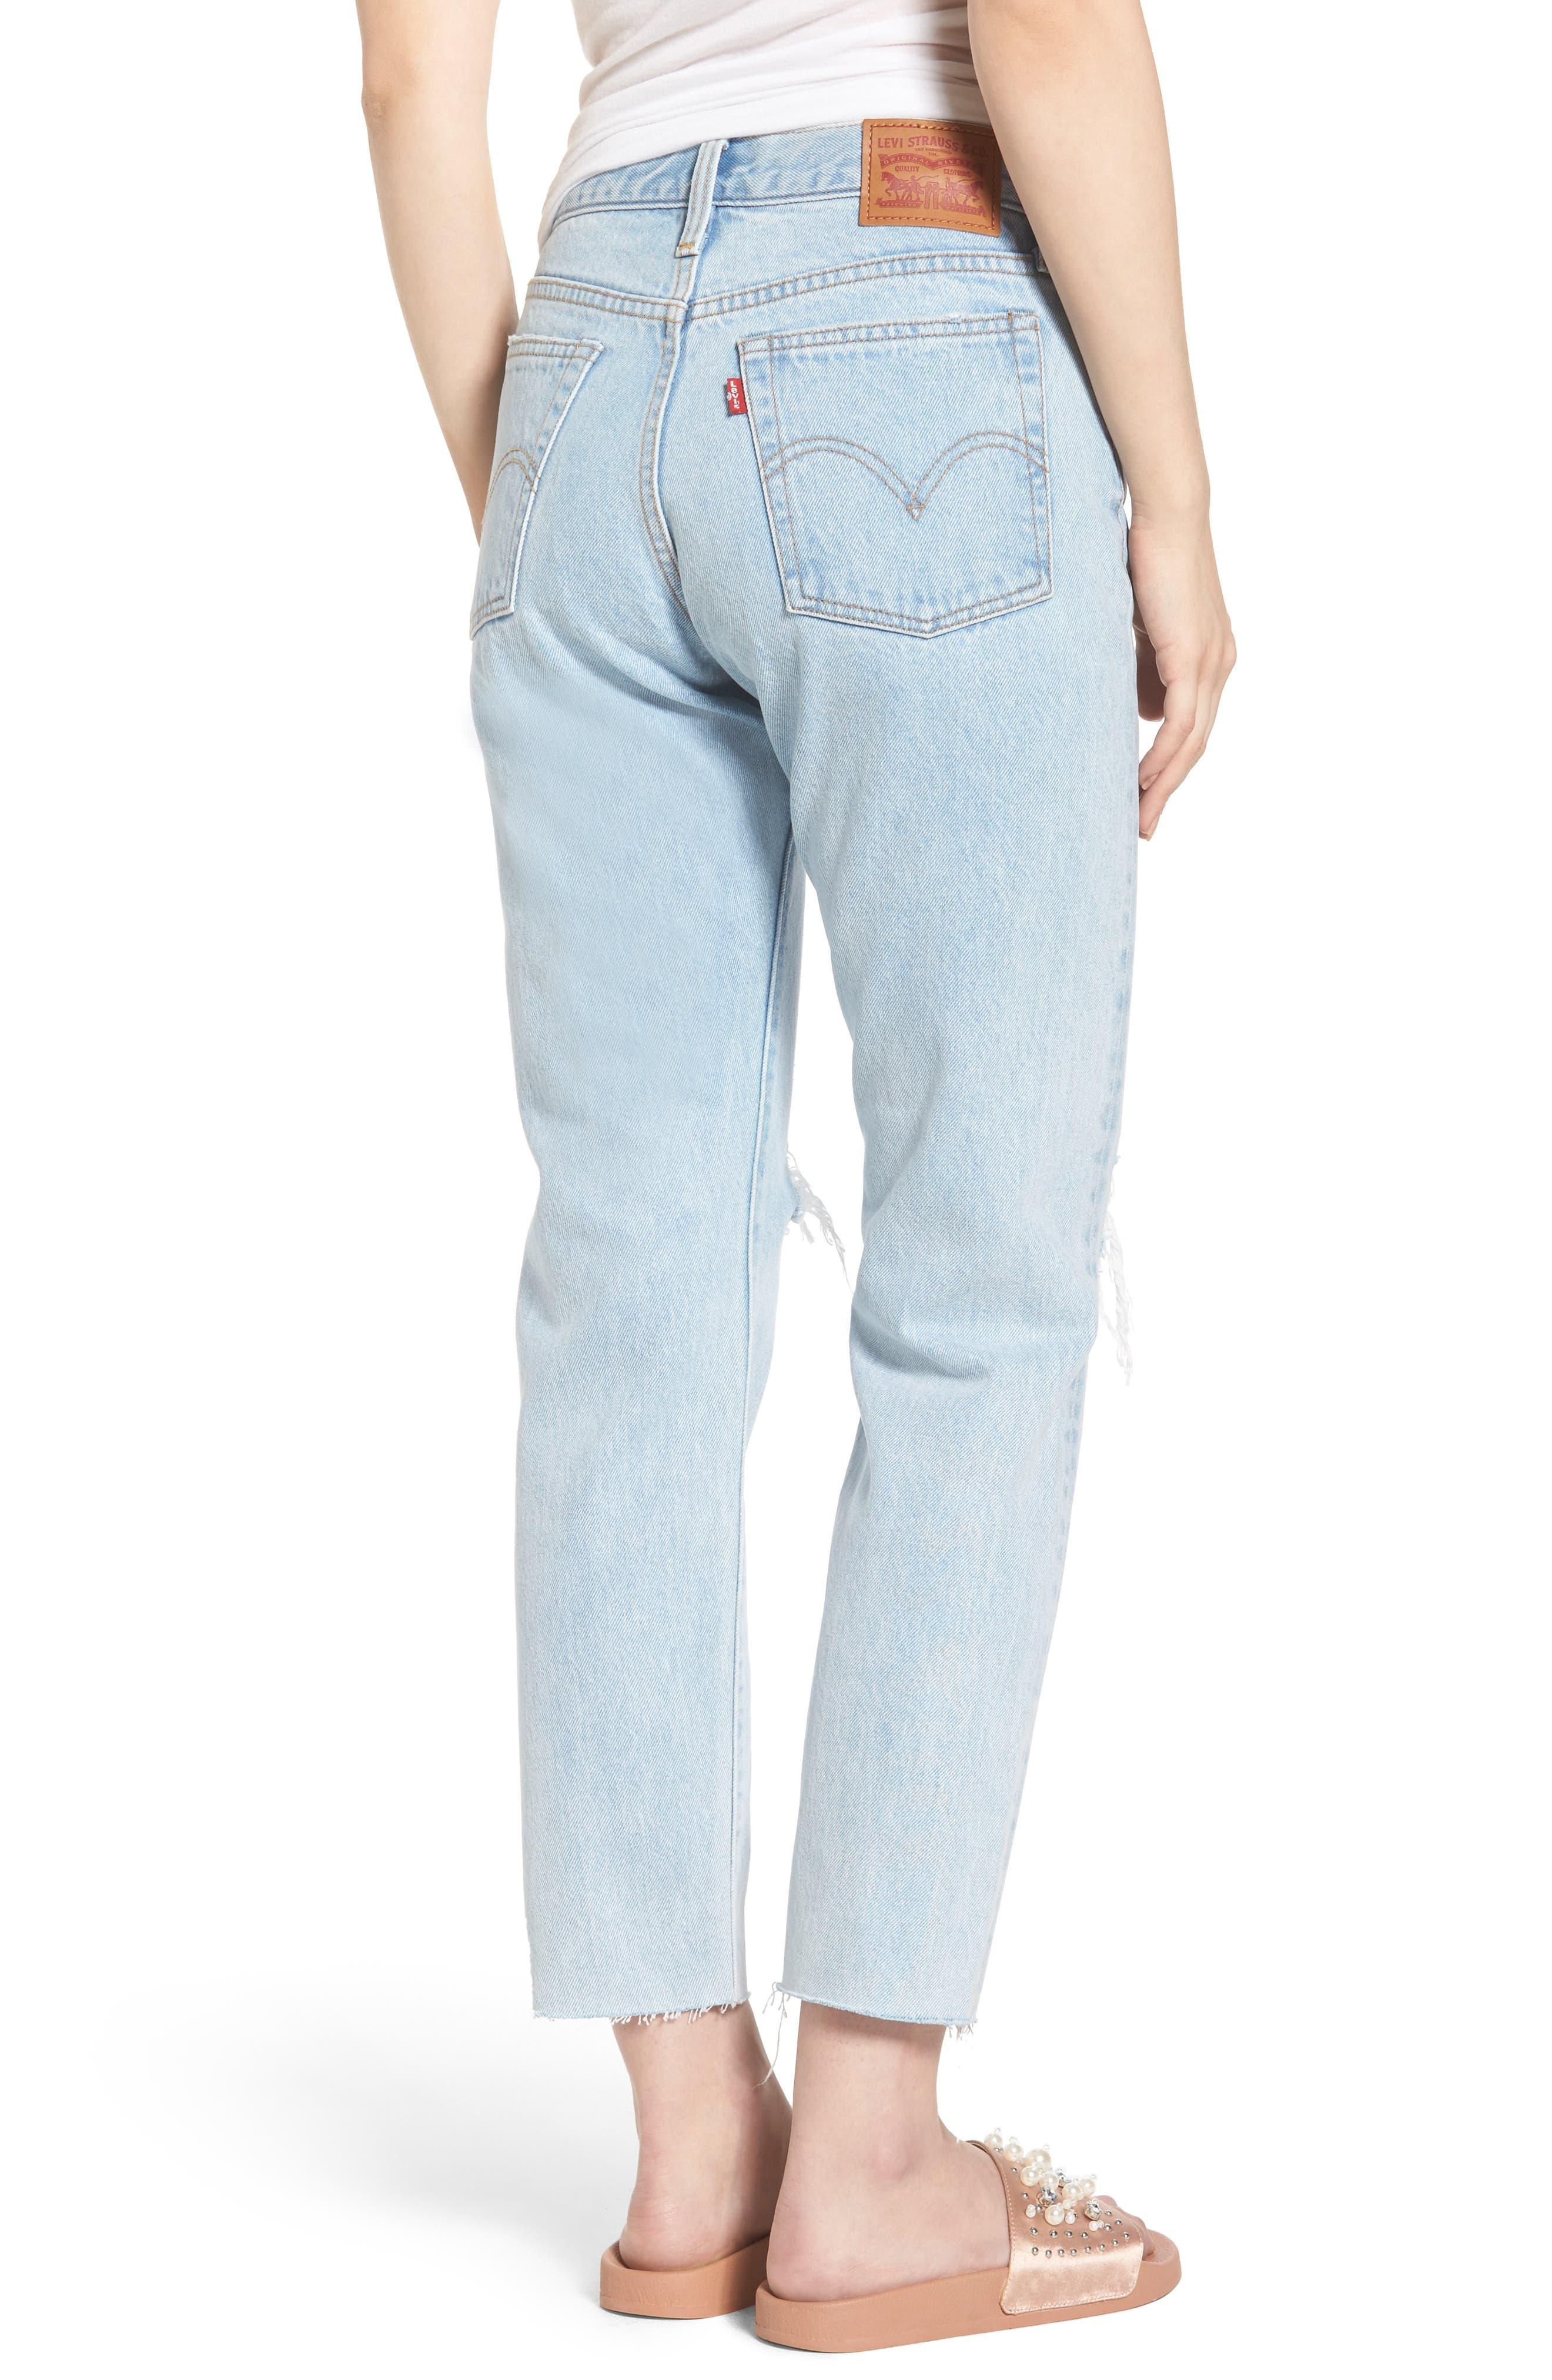 Wedgie High Waist Crop Jeans,                             Alternate thumbnail 2, color,                             450